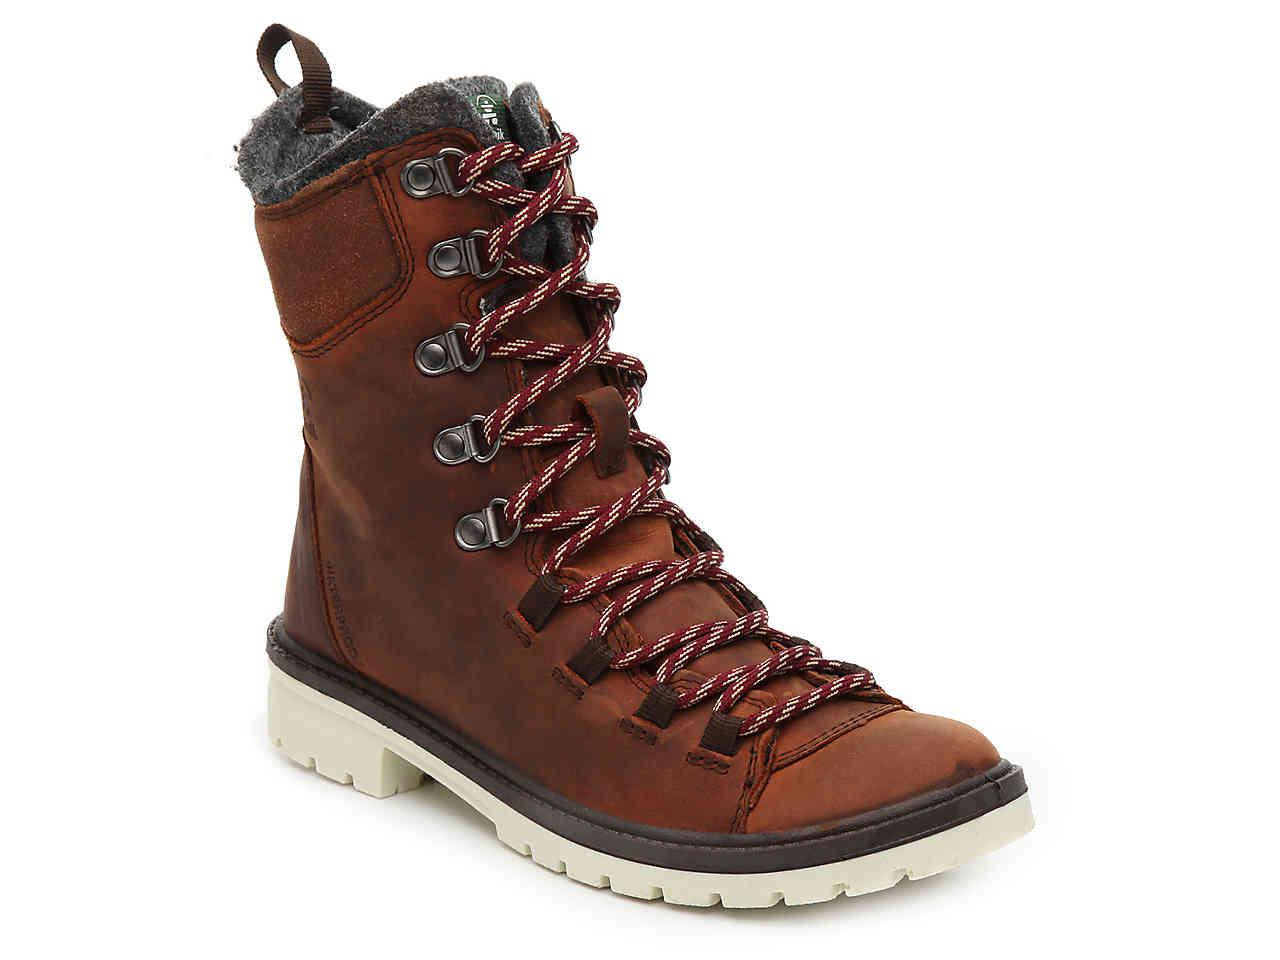 e29ecc9217f1e Kamik Roguehiker Waterproof Hiking Boot in Brown - Lyst